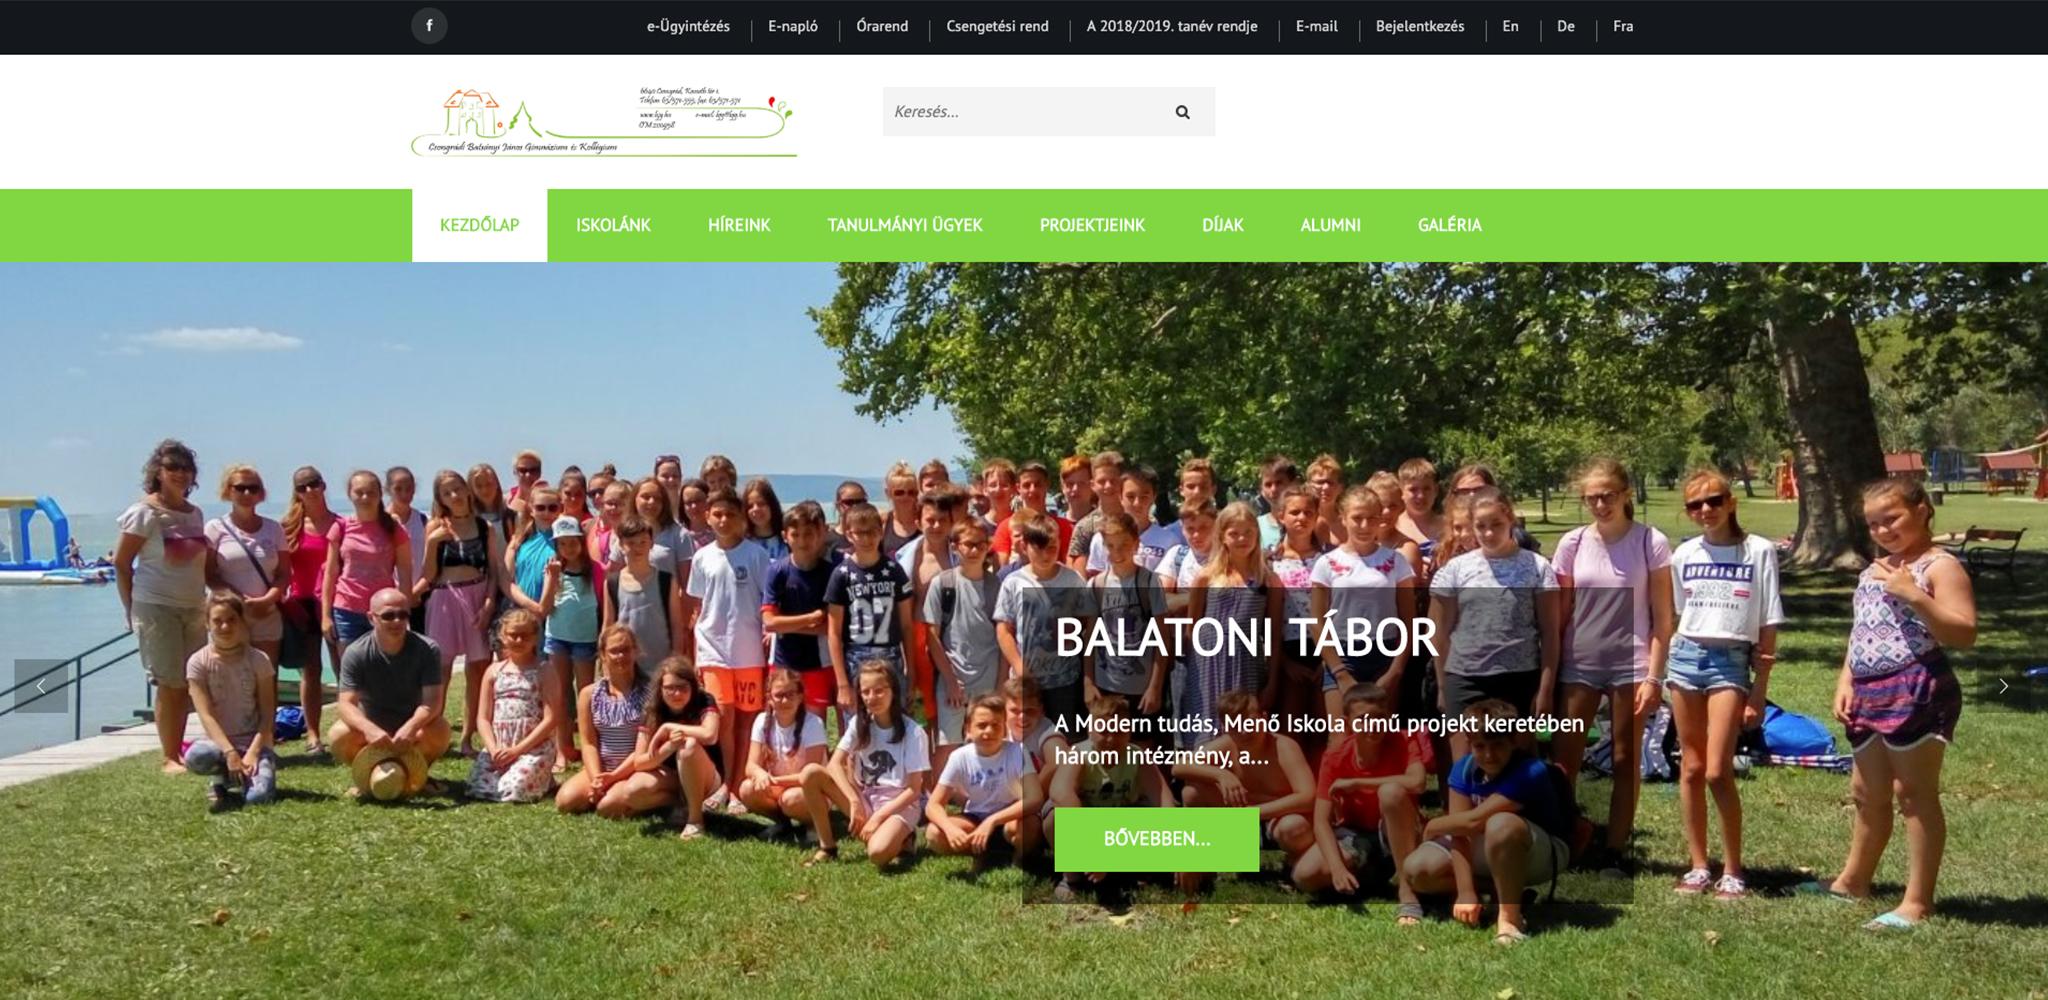 bjg website